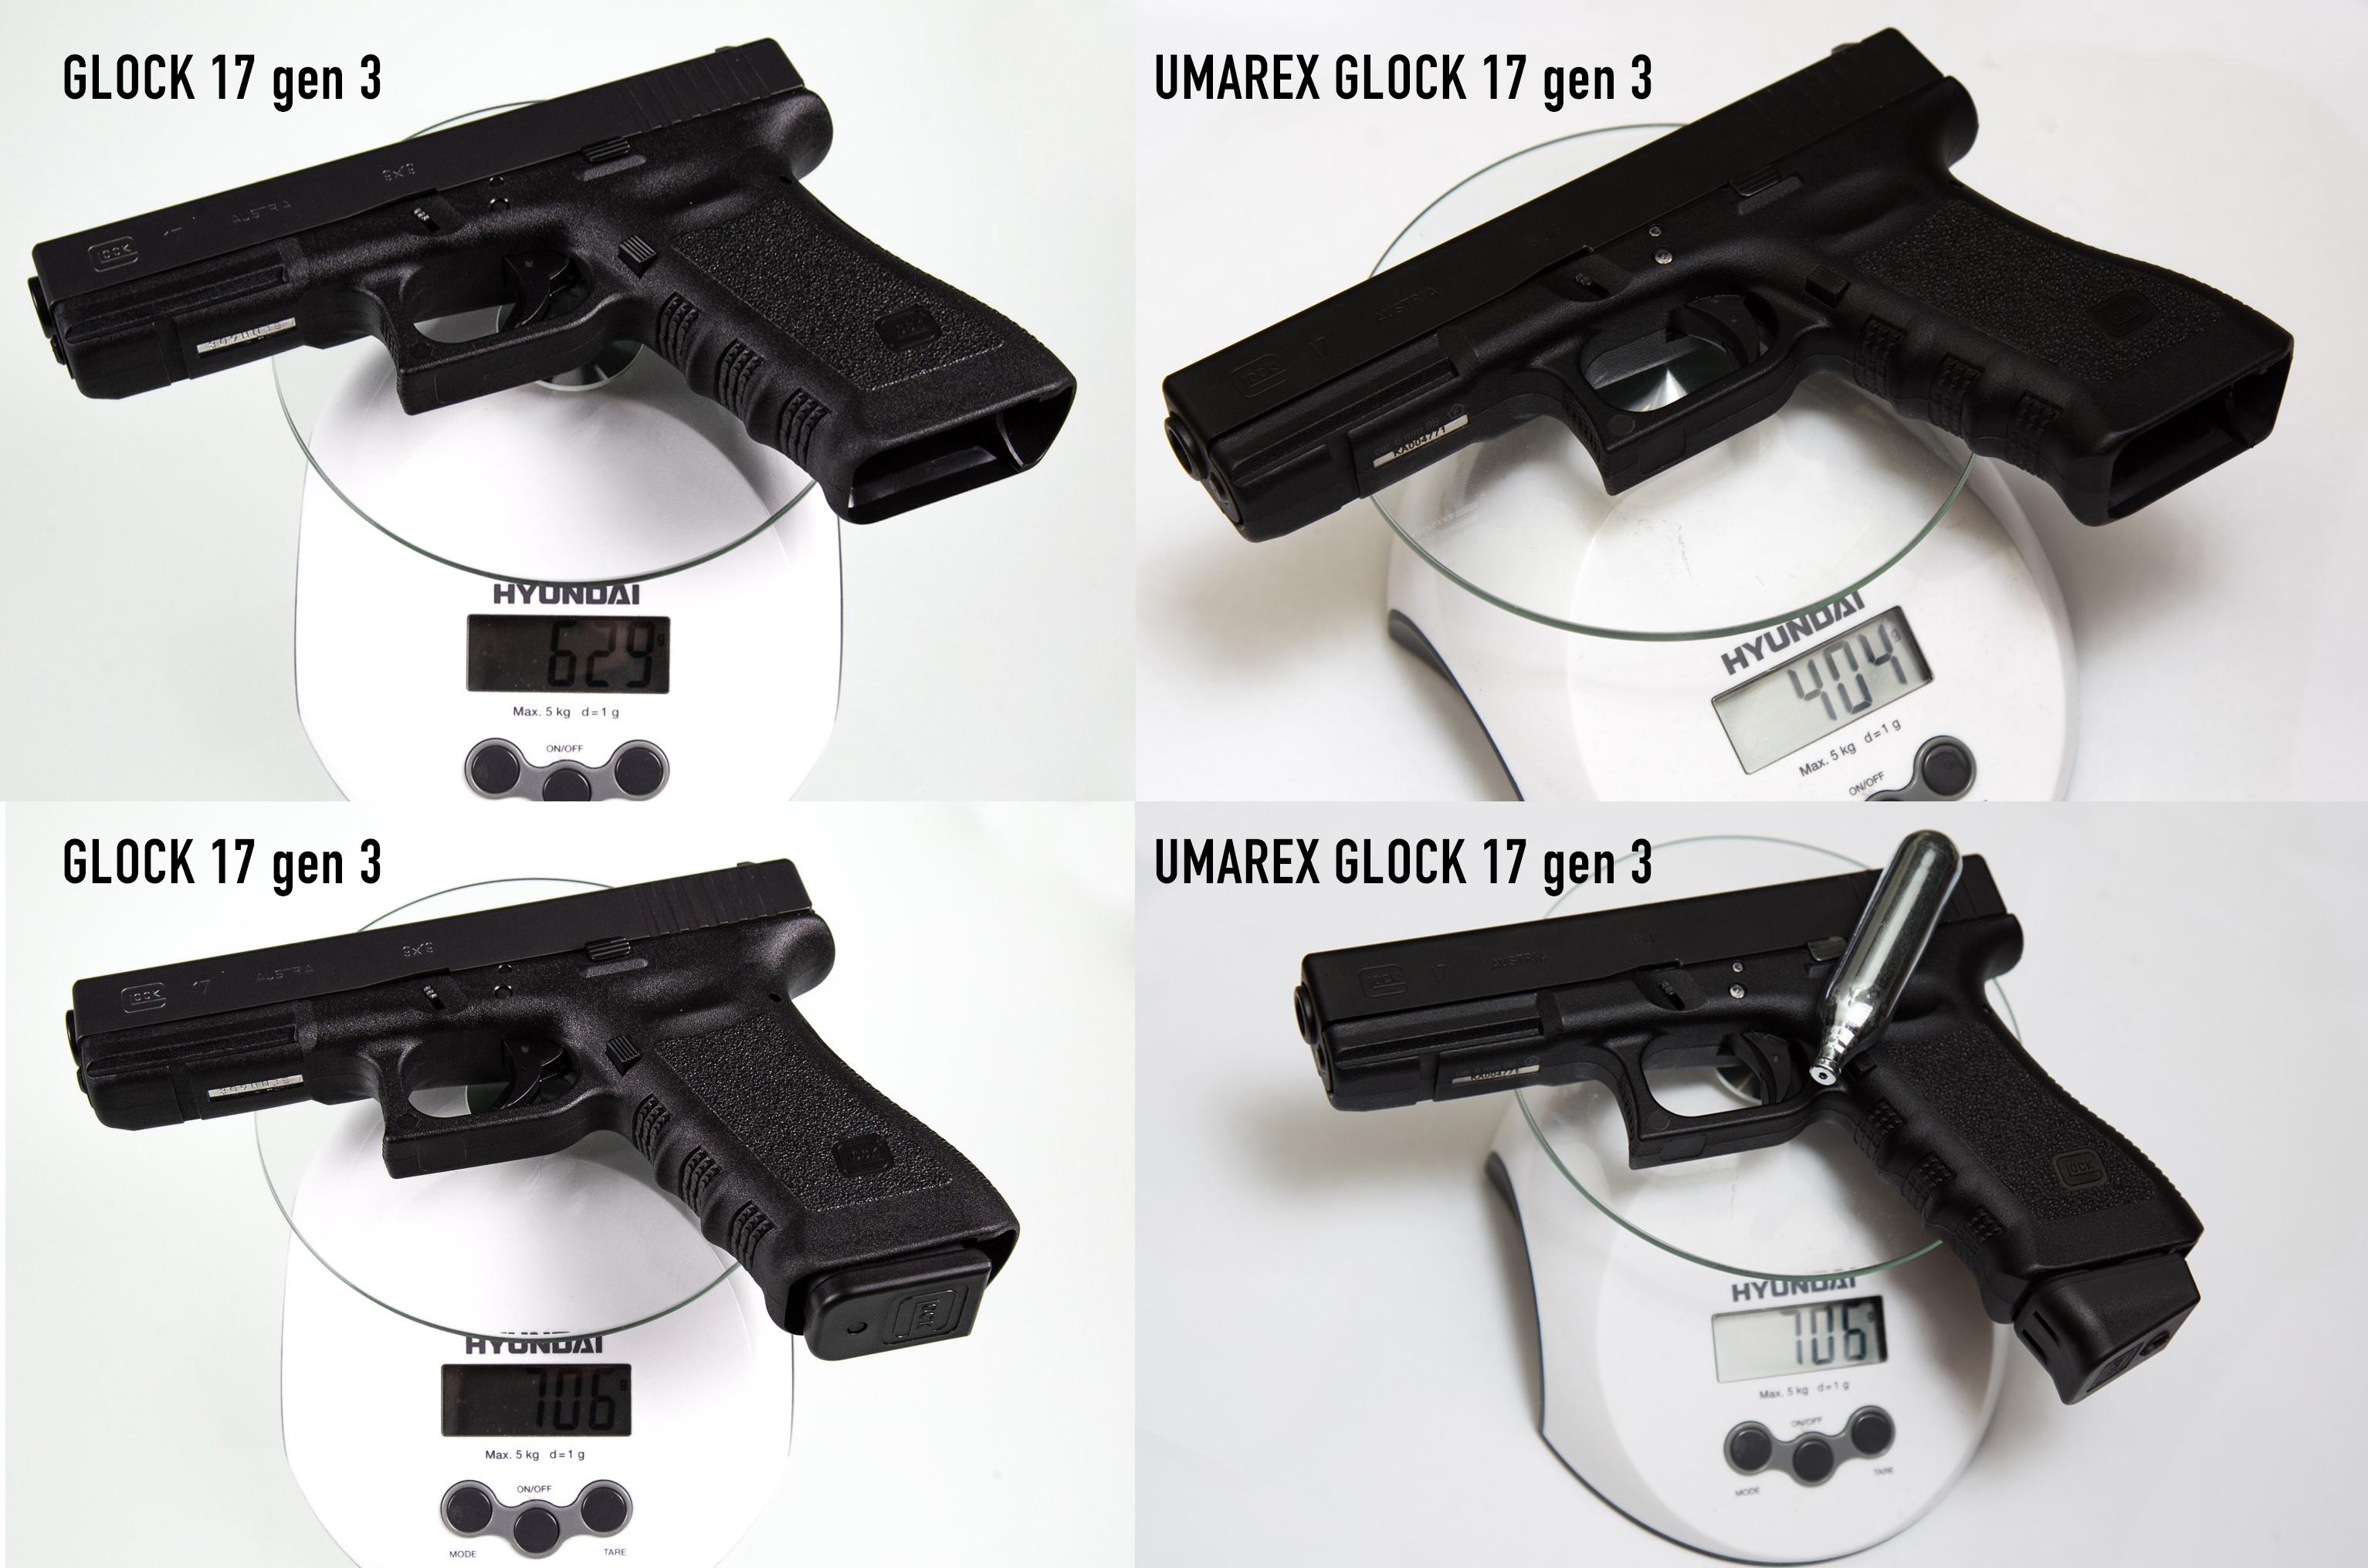 Glock 17 Gen 3 Deluxe Edition Umarex/VF - WMASG com